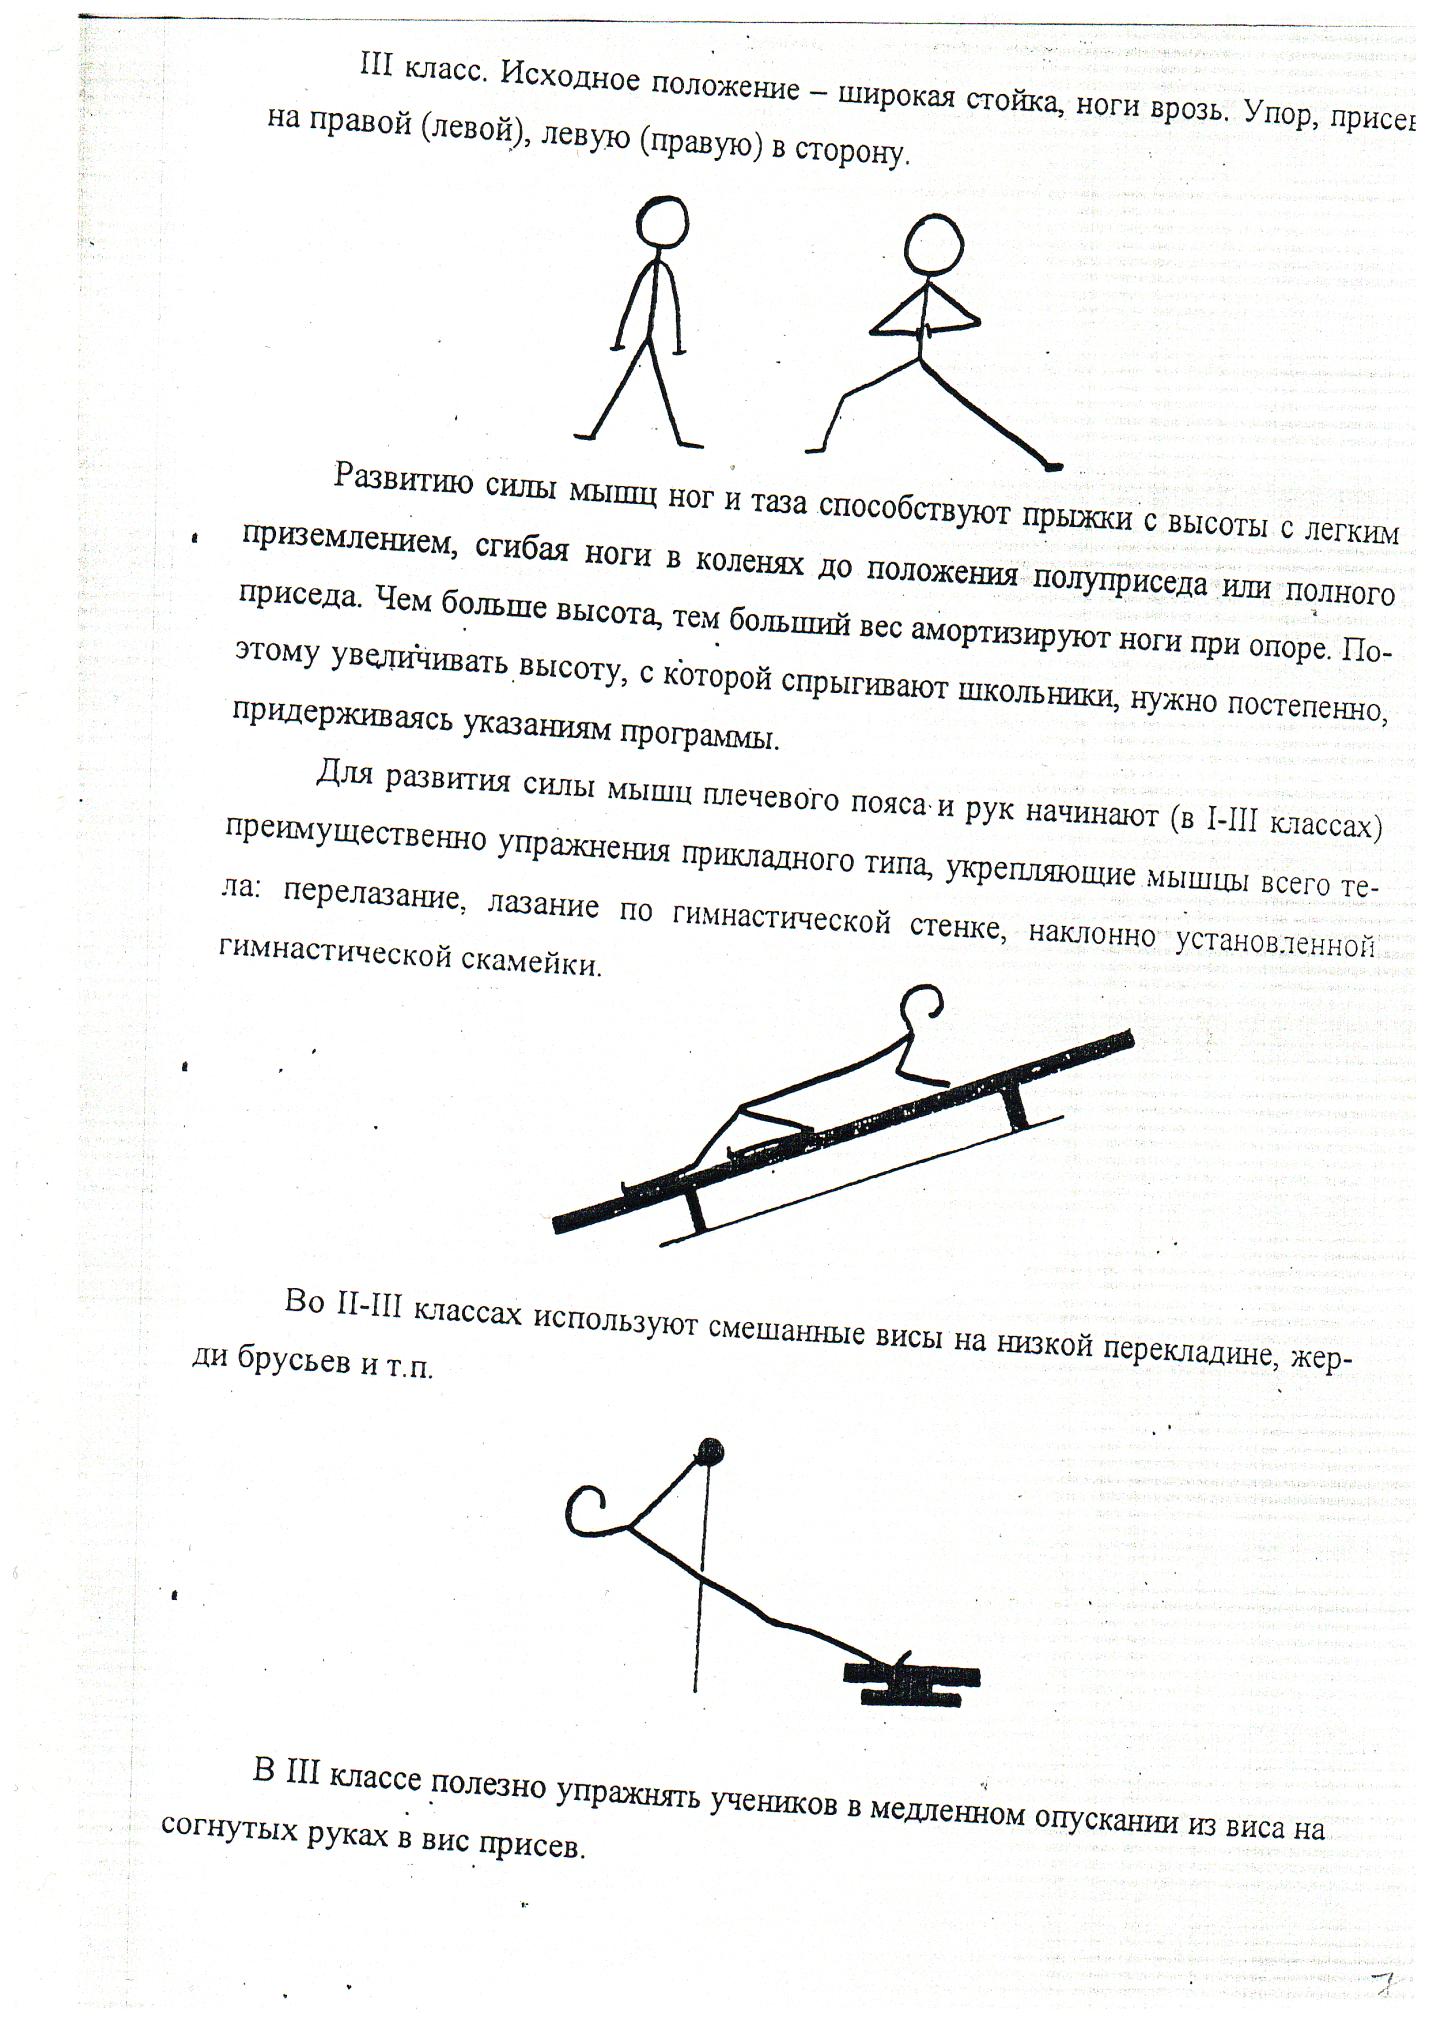 C:\Users\Татьяна\Desktop\7 001.BMP